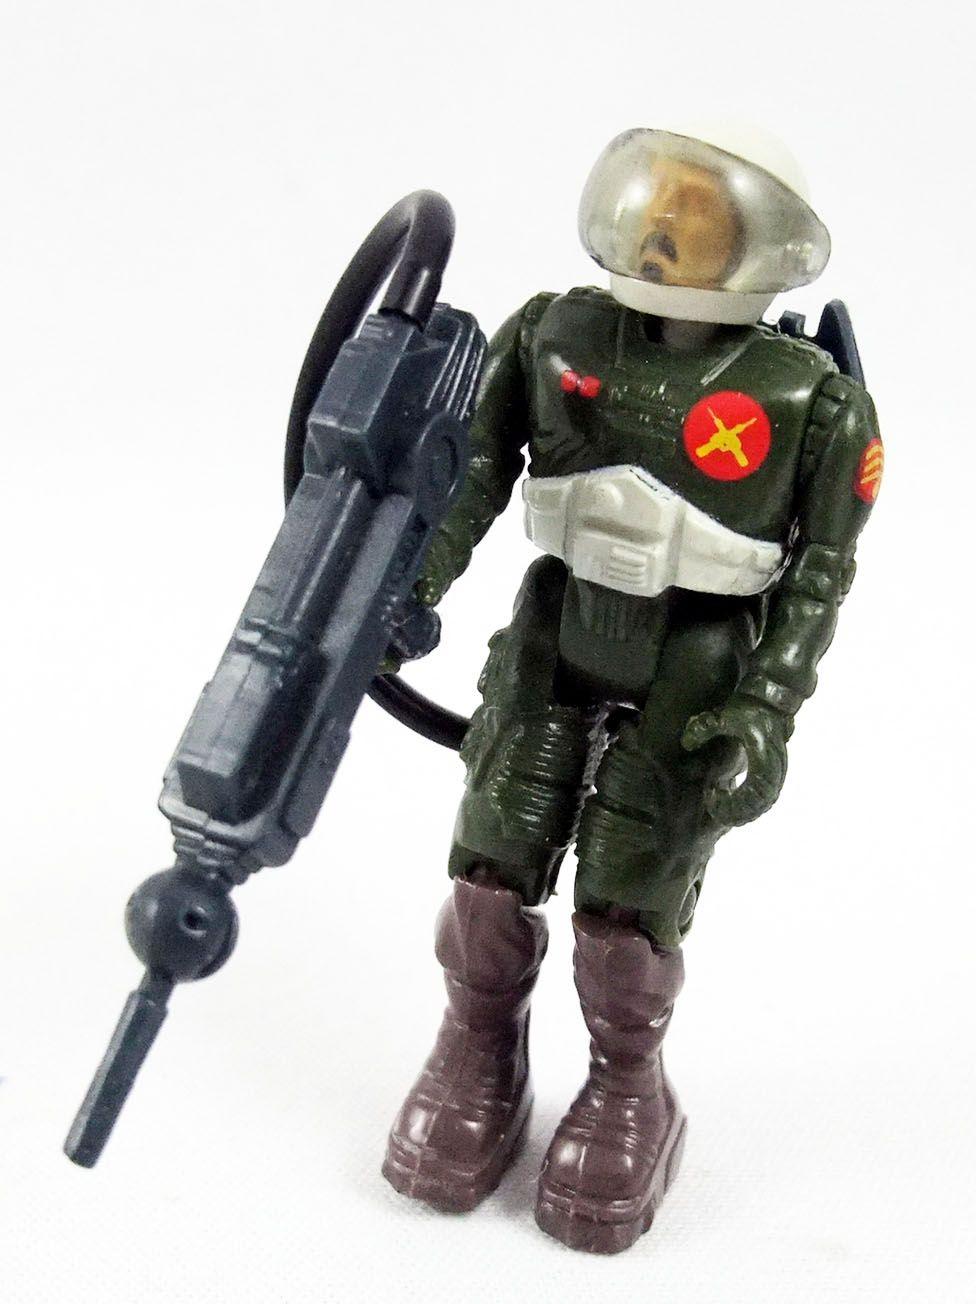 Starcom - Coleco - Sgt. Hector Morales (loose)